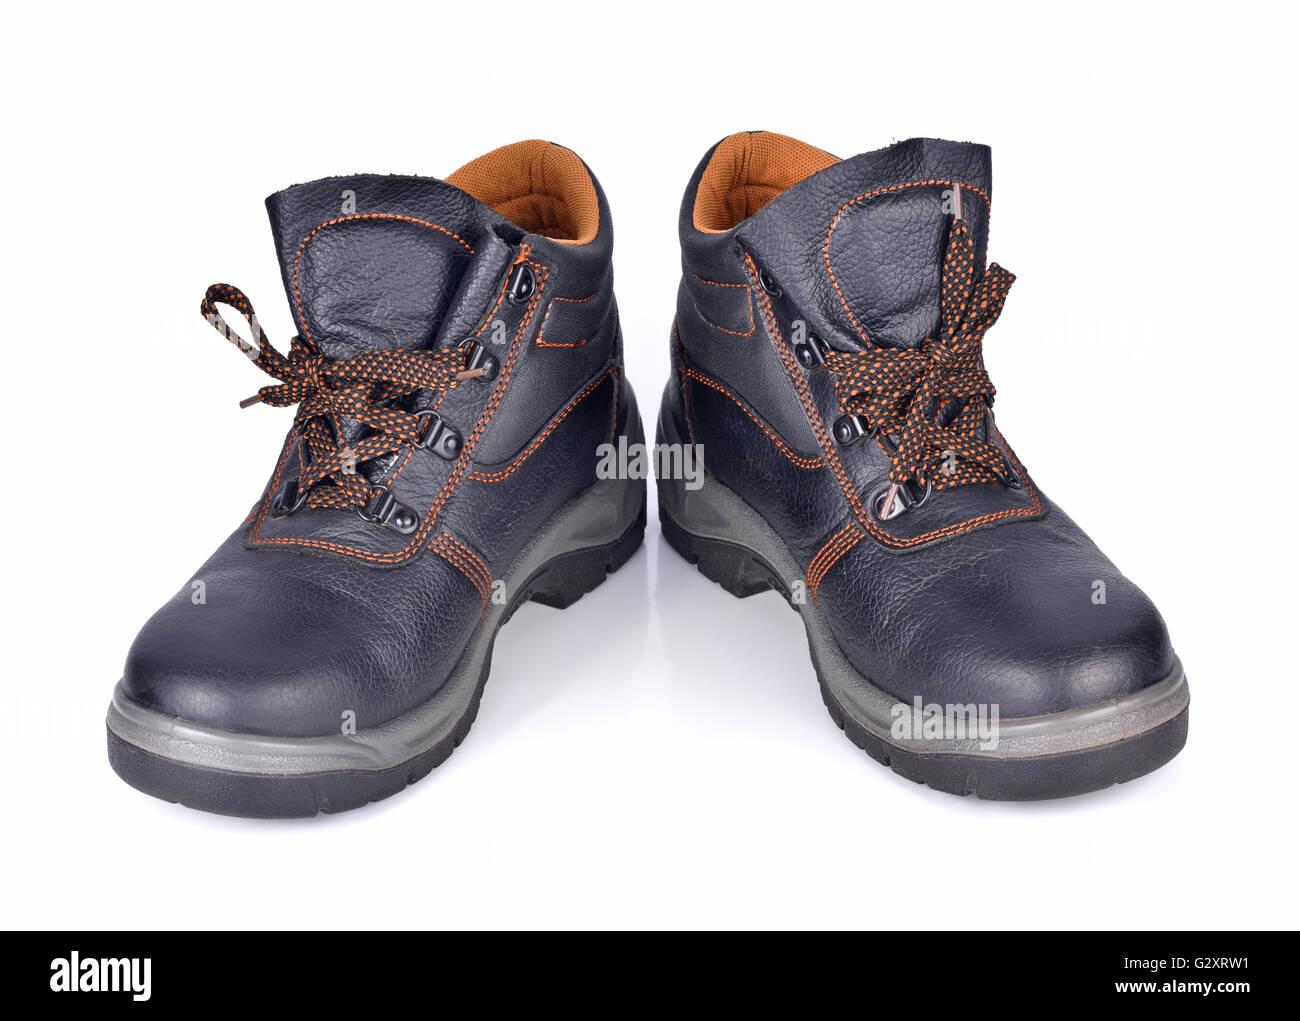 Safety Shoes isolated on white background - Stock Image